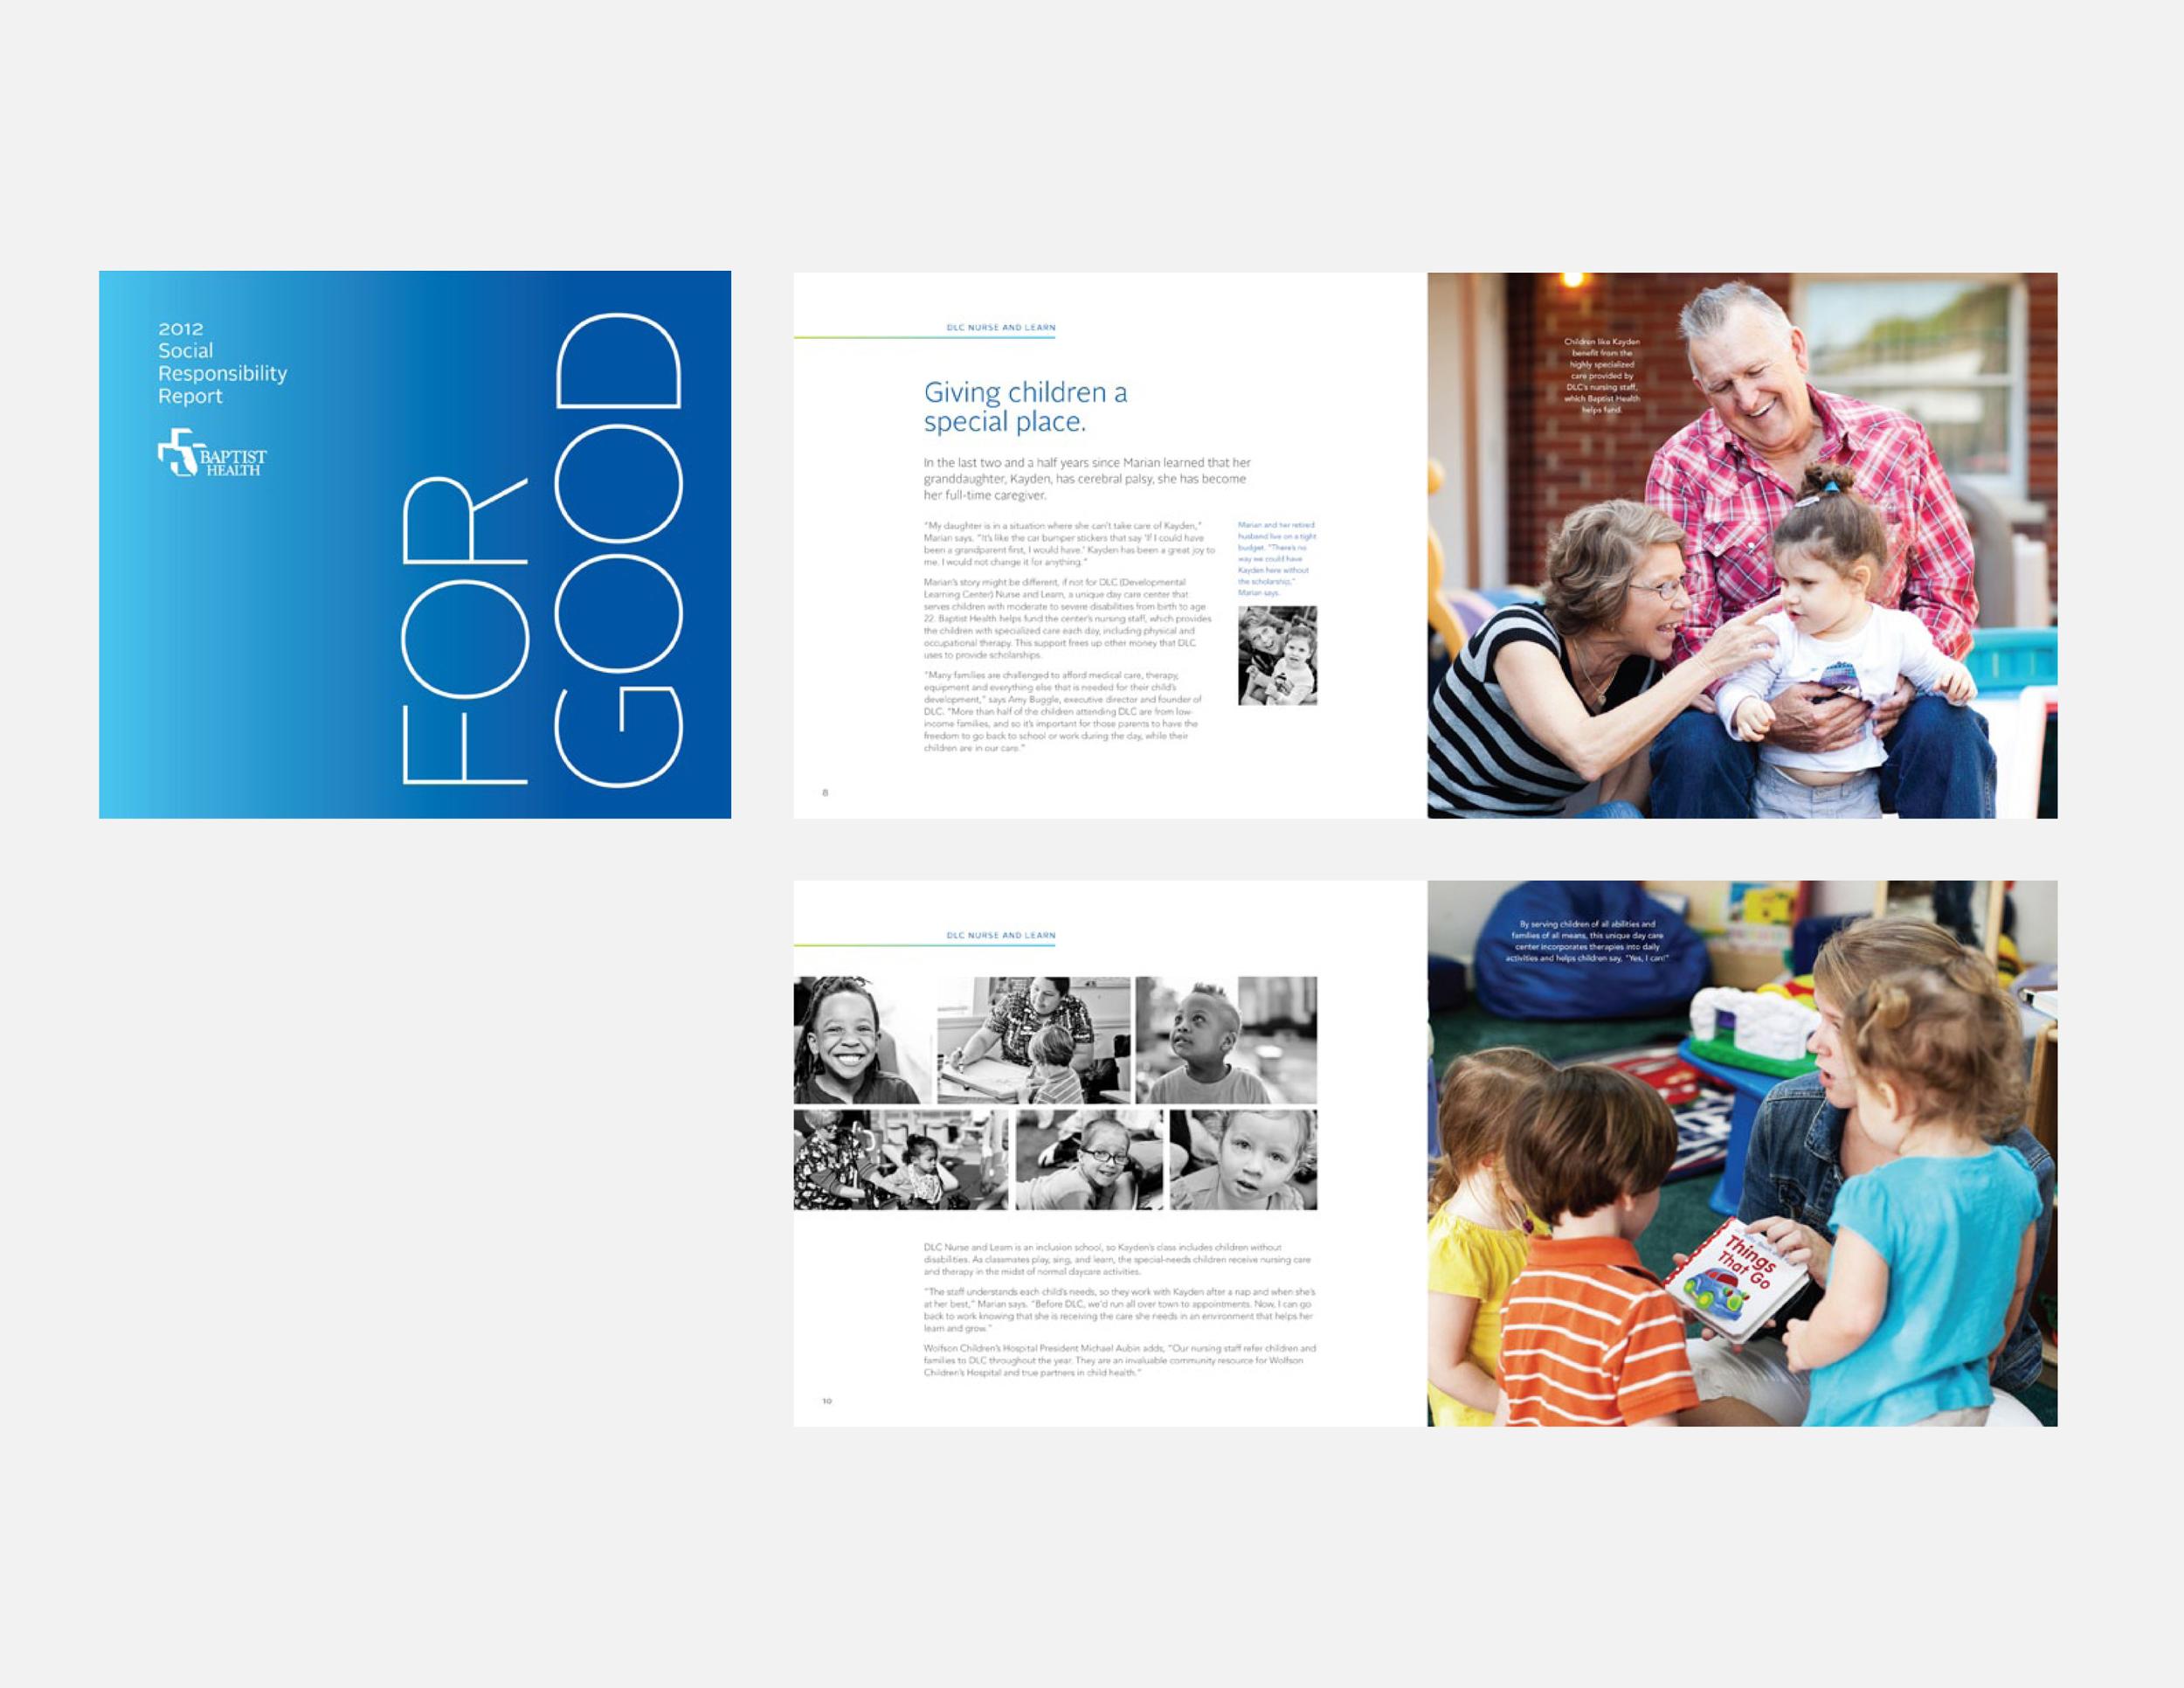 Baptist Health 2012 Social Responsibility Report